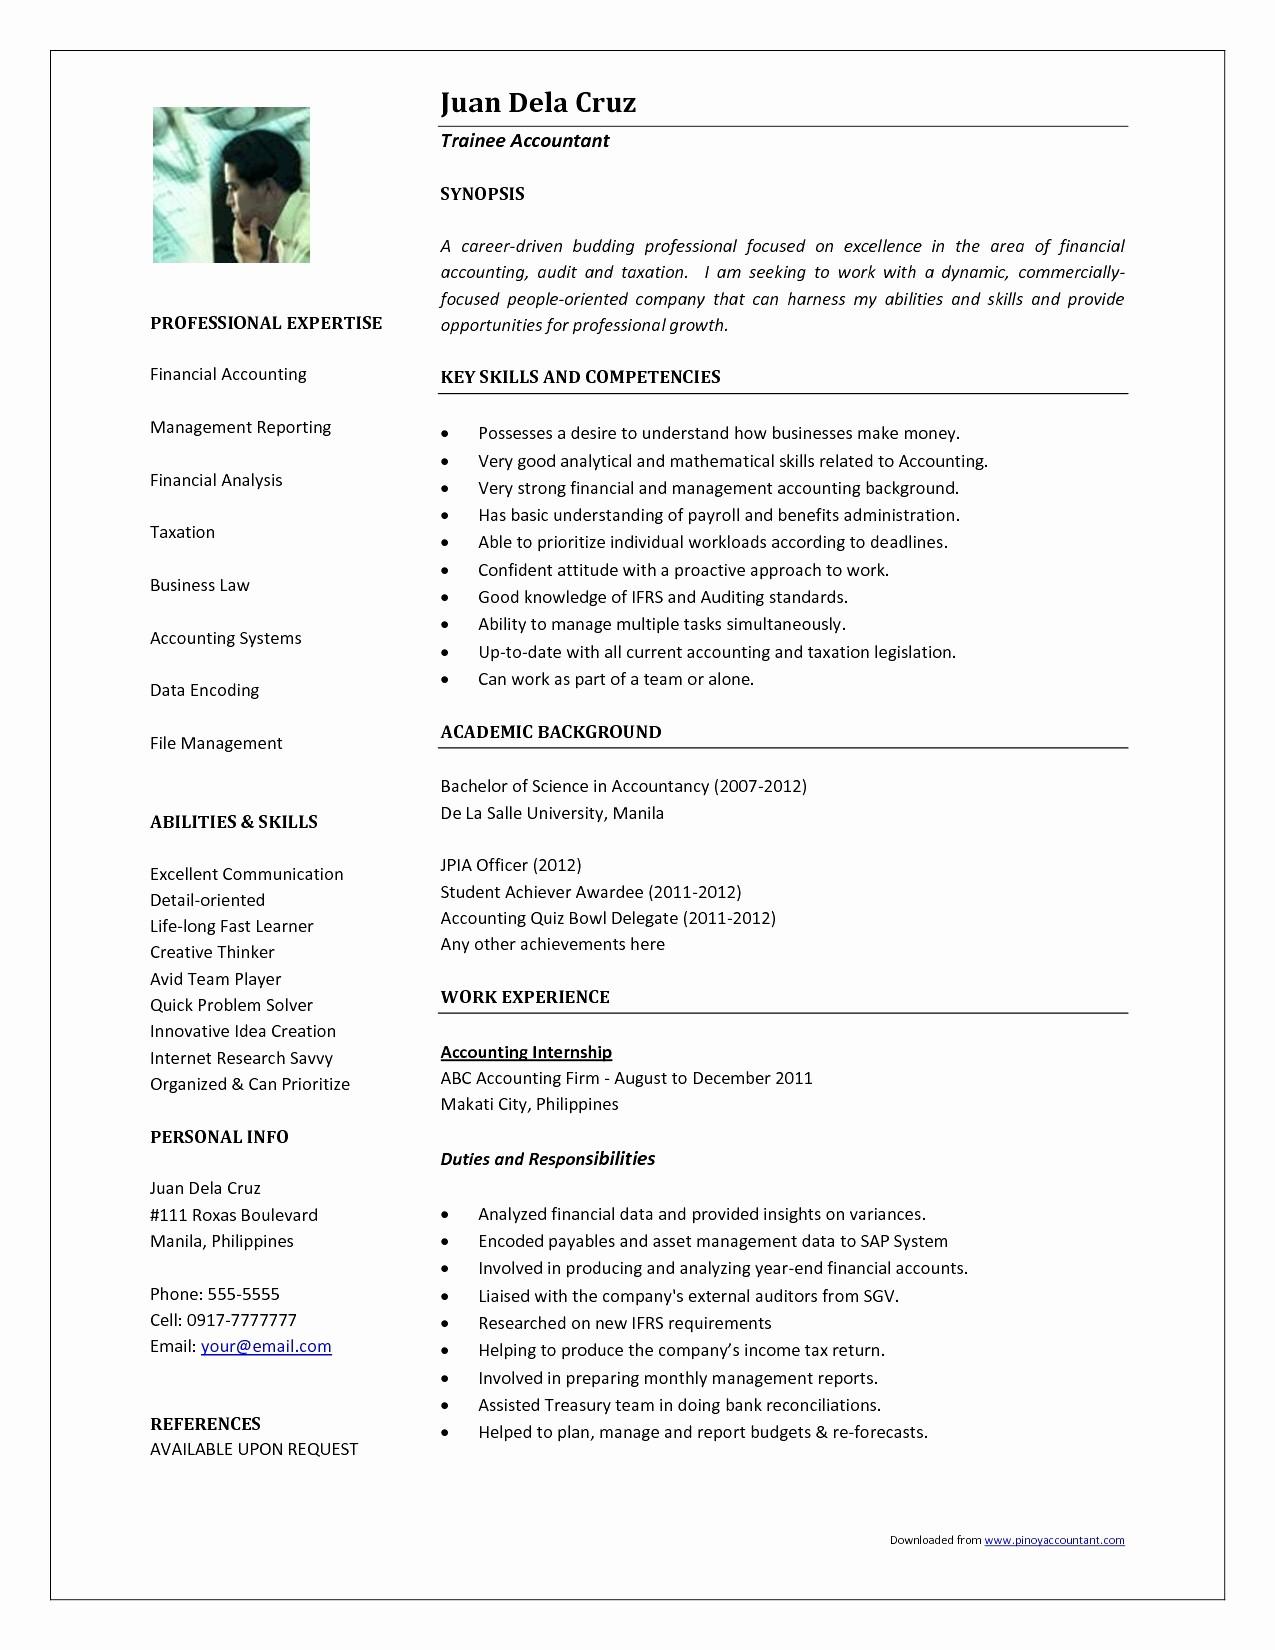 Letter Of Understanding Template - Inspirational Letter Understanding Template